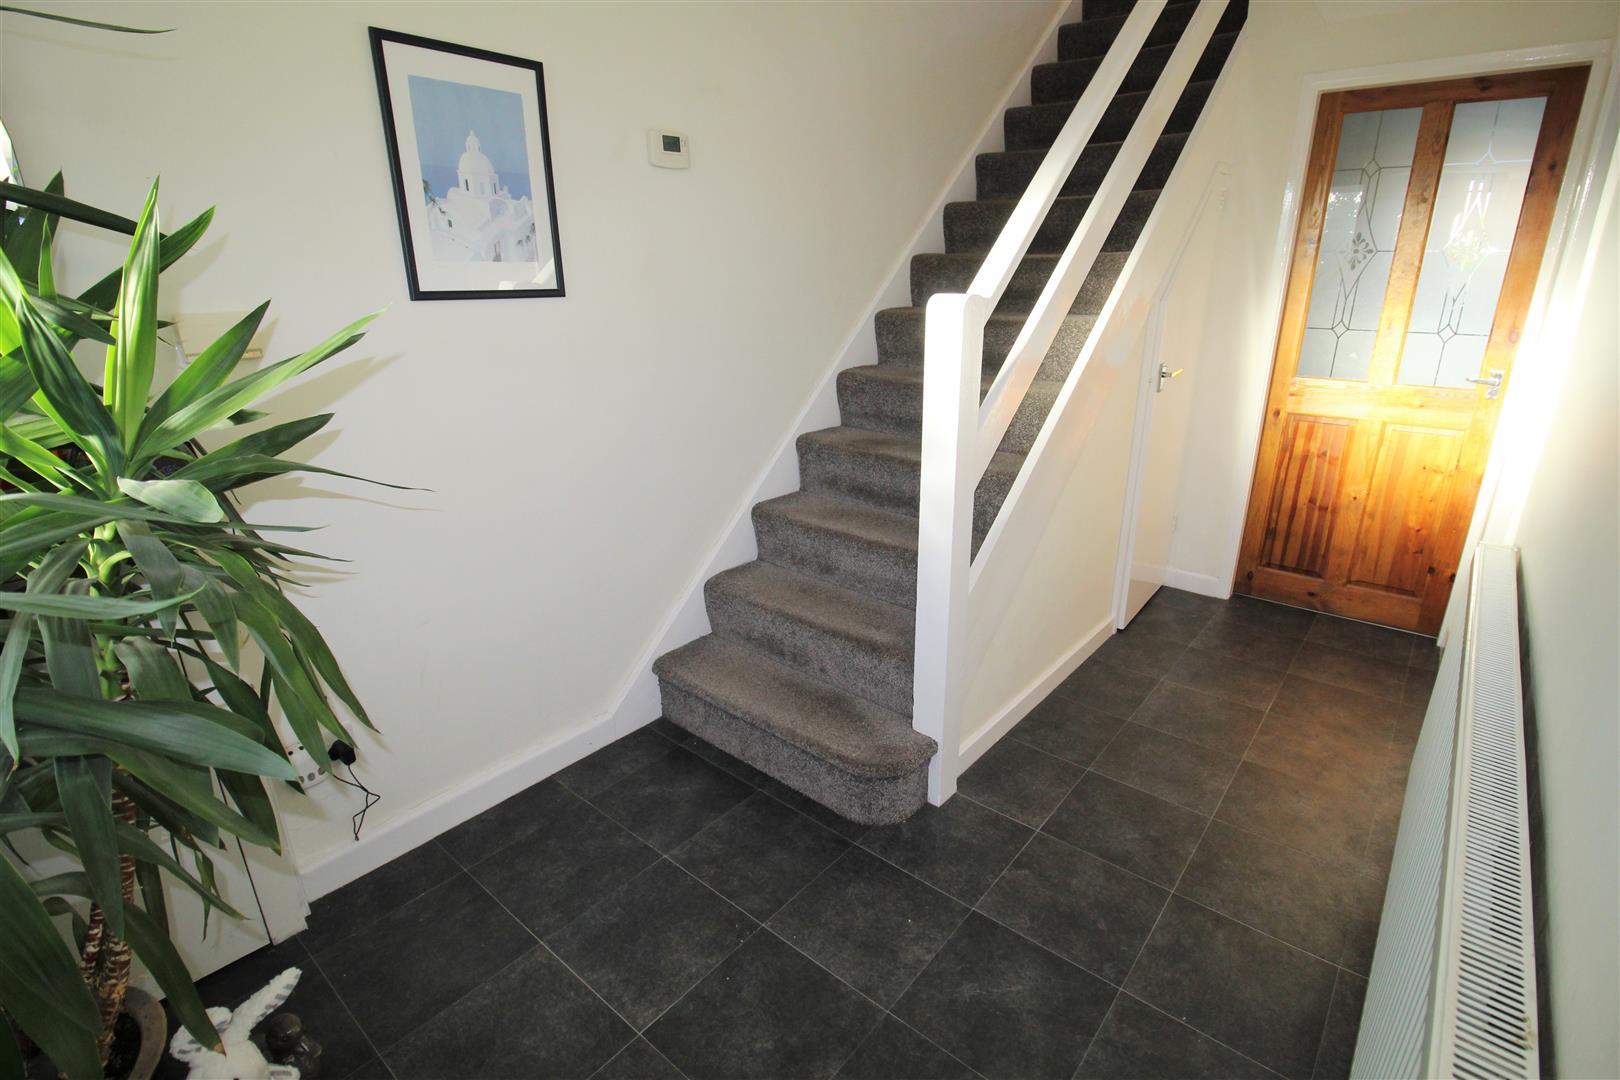 3 Bedrooms, House - Semi-Detached, Uppingham Avenue, Aintree, Liverpool